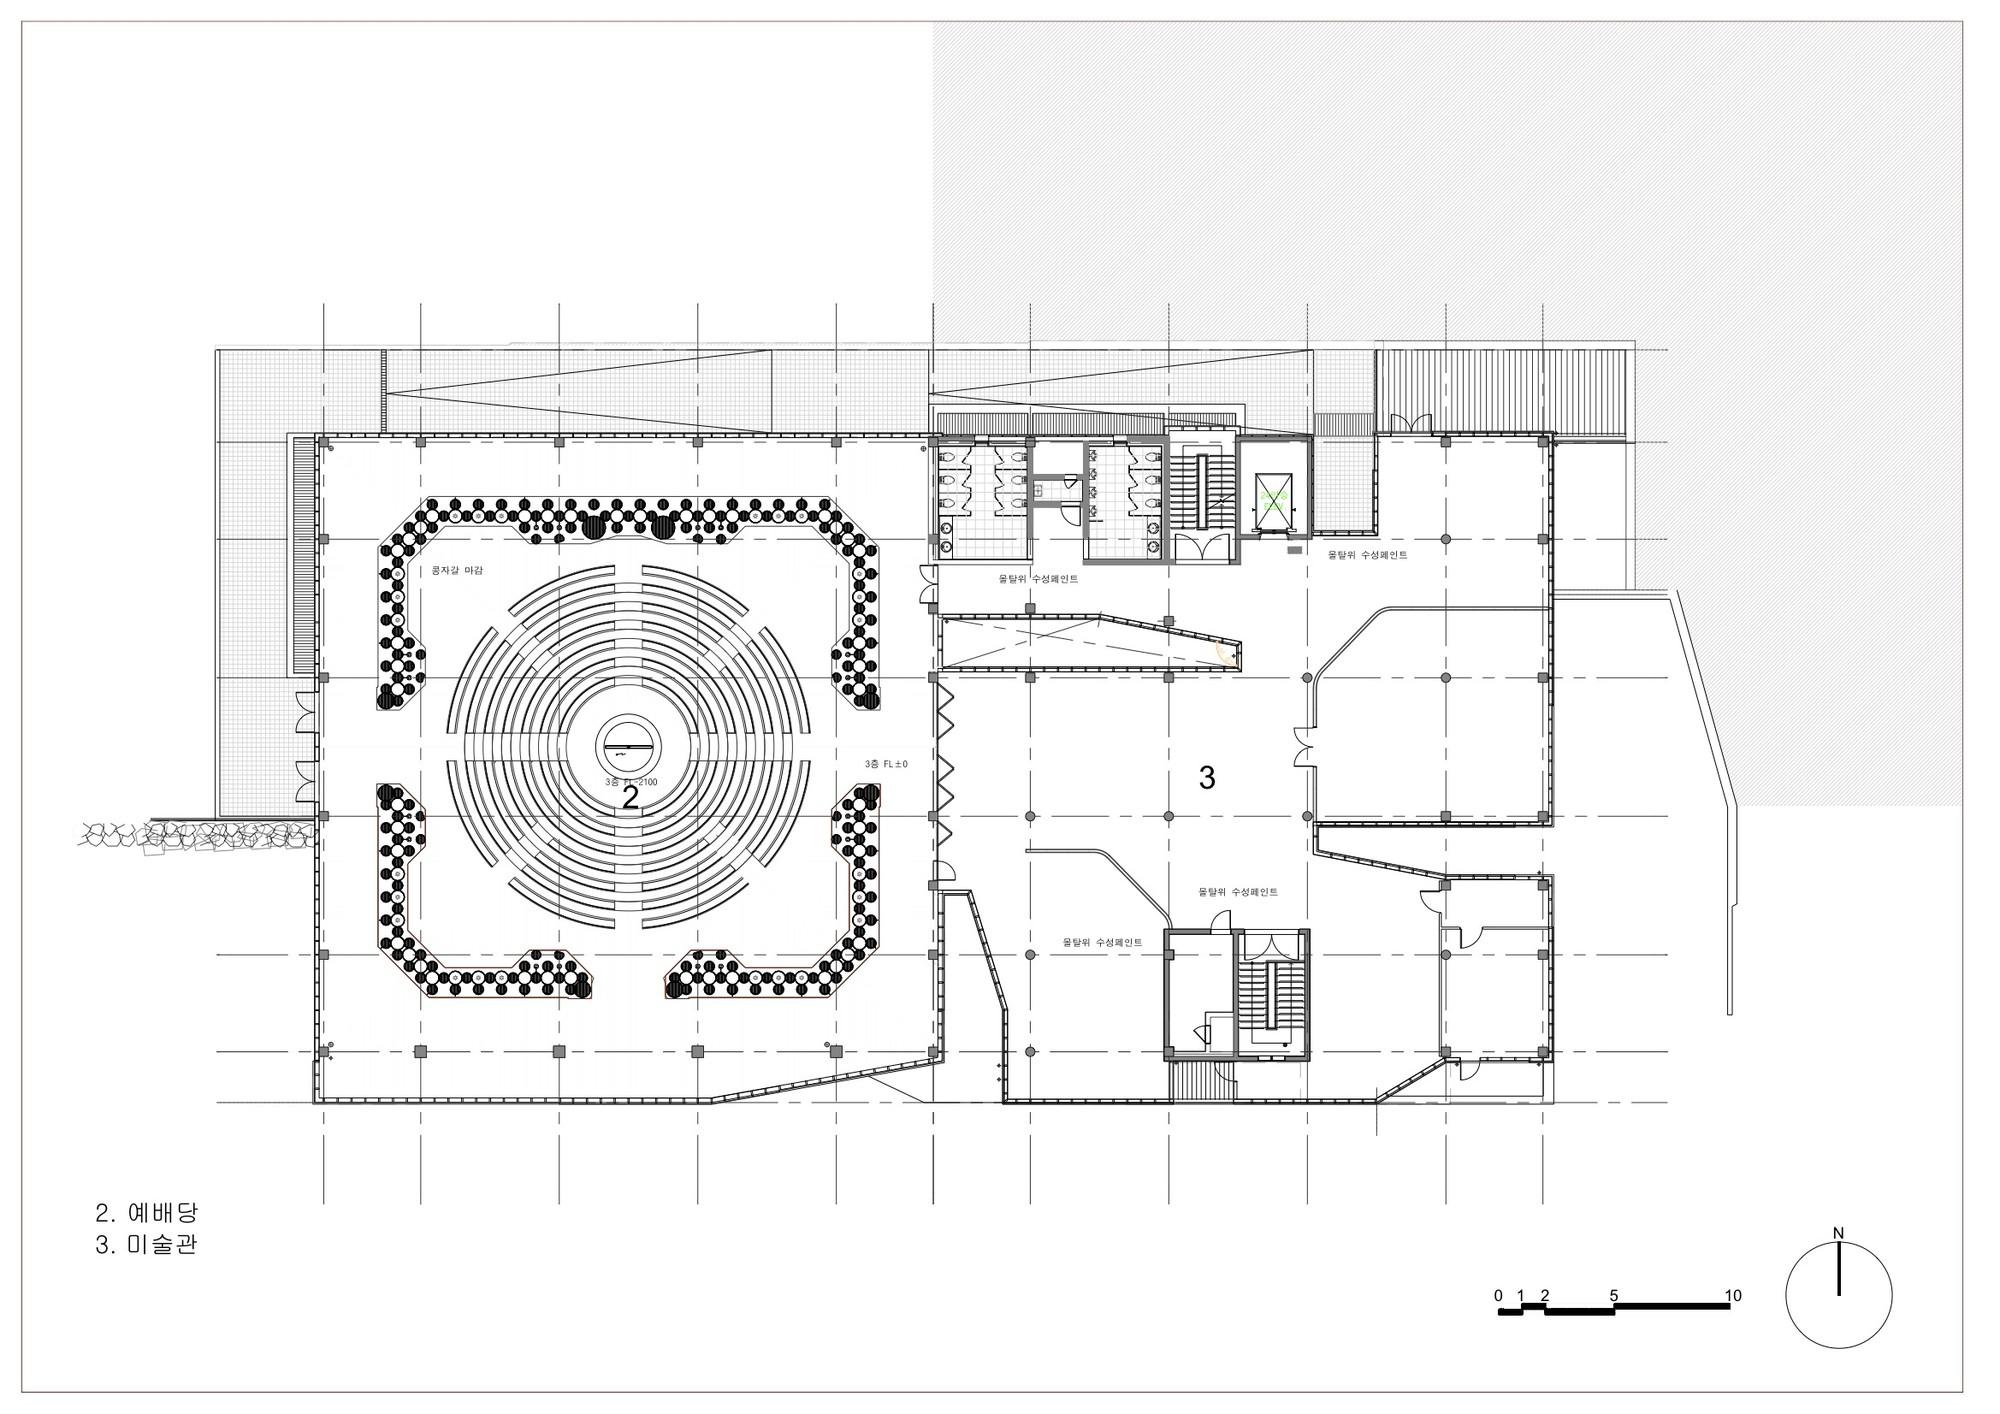 Ordinary Church Of Light Floor Plan Part - 9: Light Of Life Church / Shinslab Architecture + IISAC. 23 / 34. Floor Plan